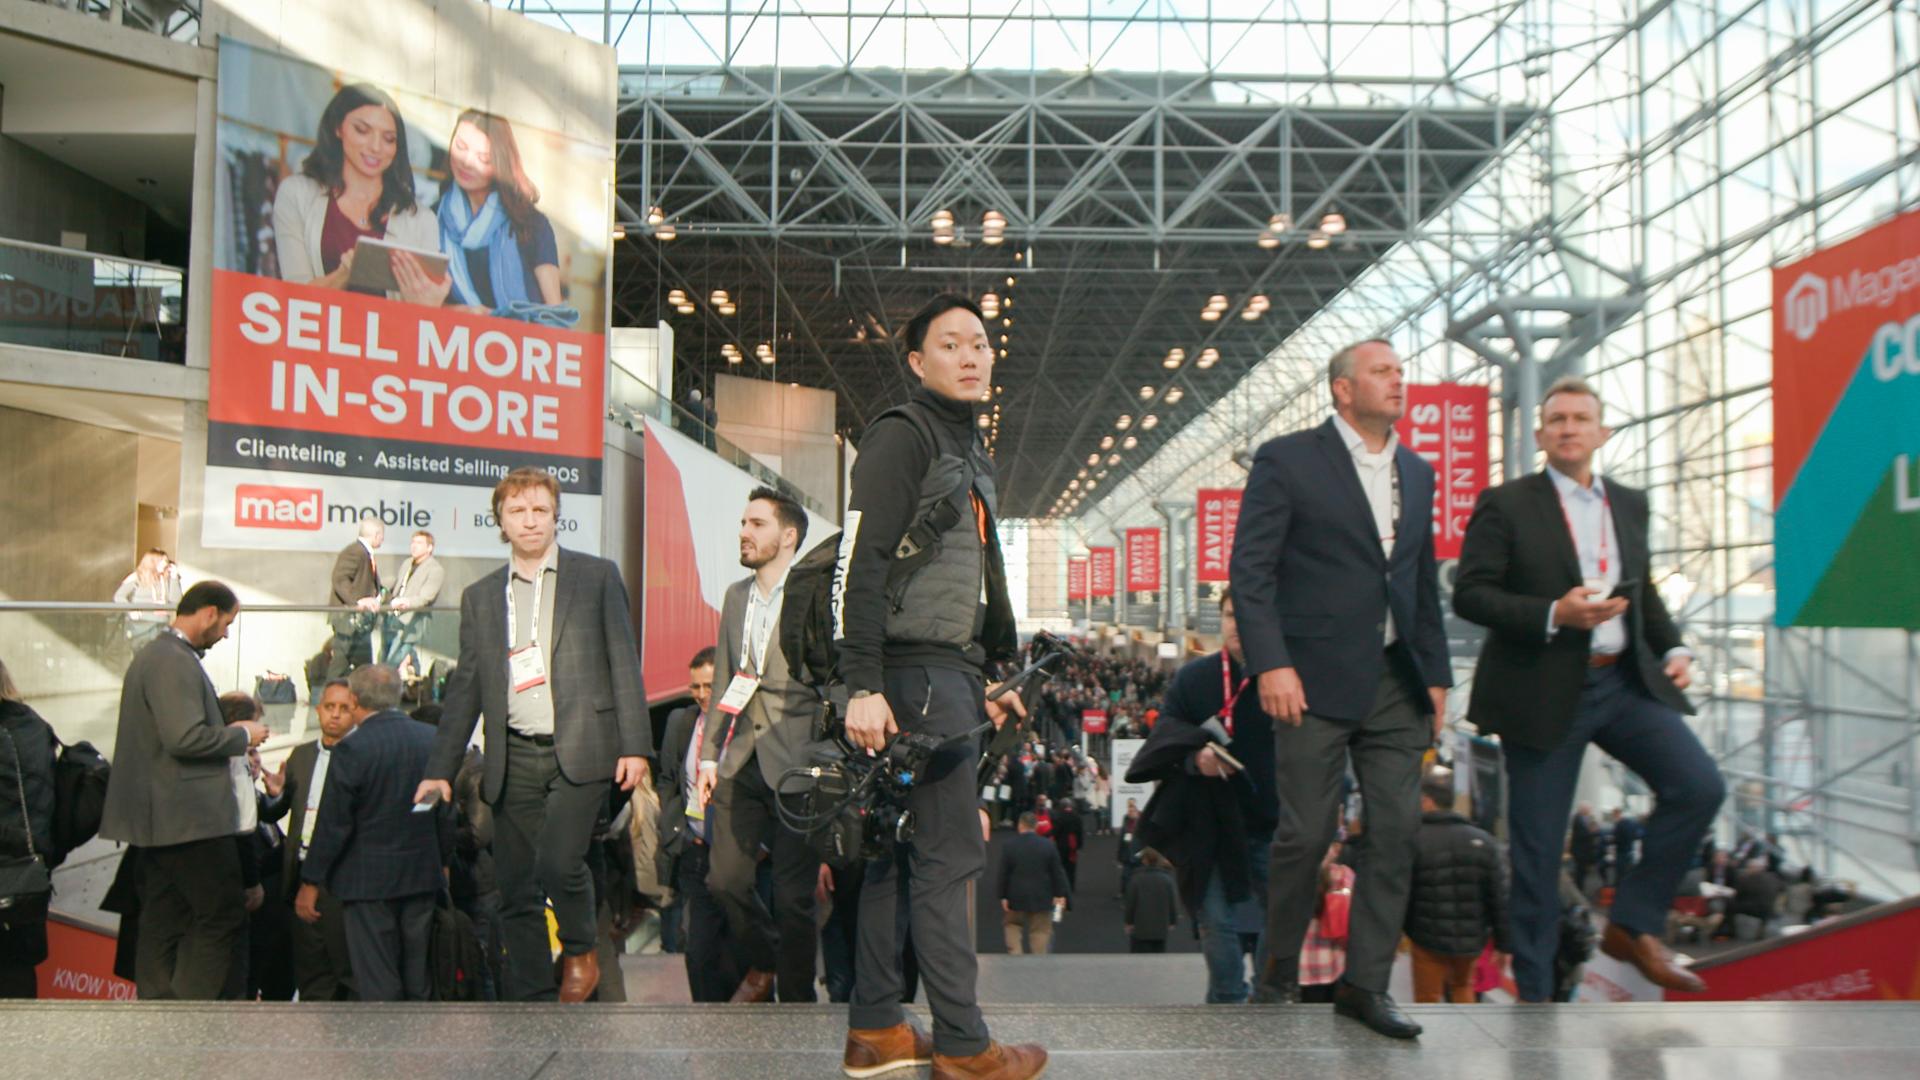 NRF 2018 Retail's Big Show Raw Behind the Scenes.00_09_51_05.Still034.jpg